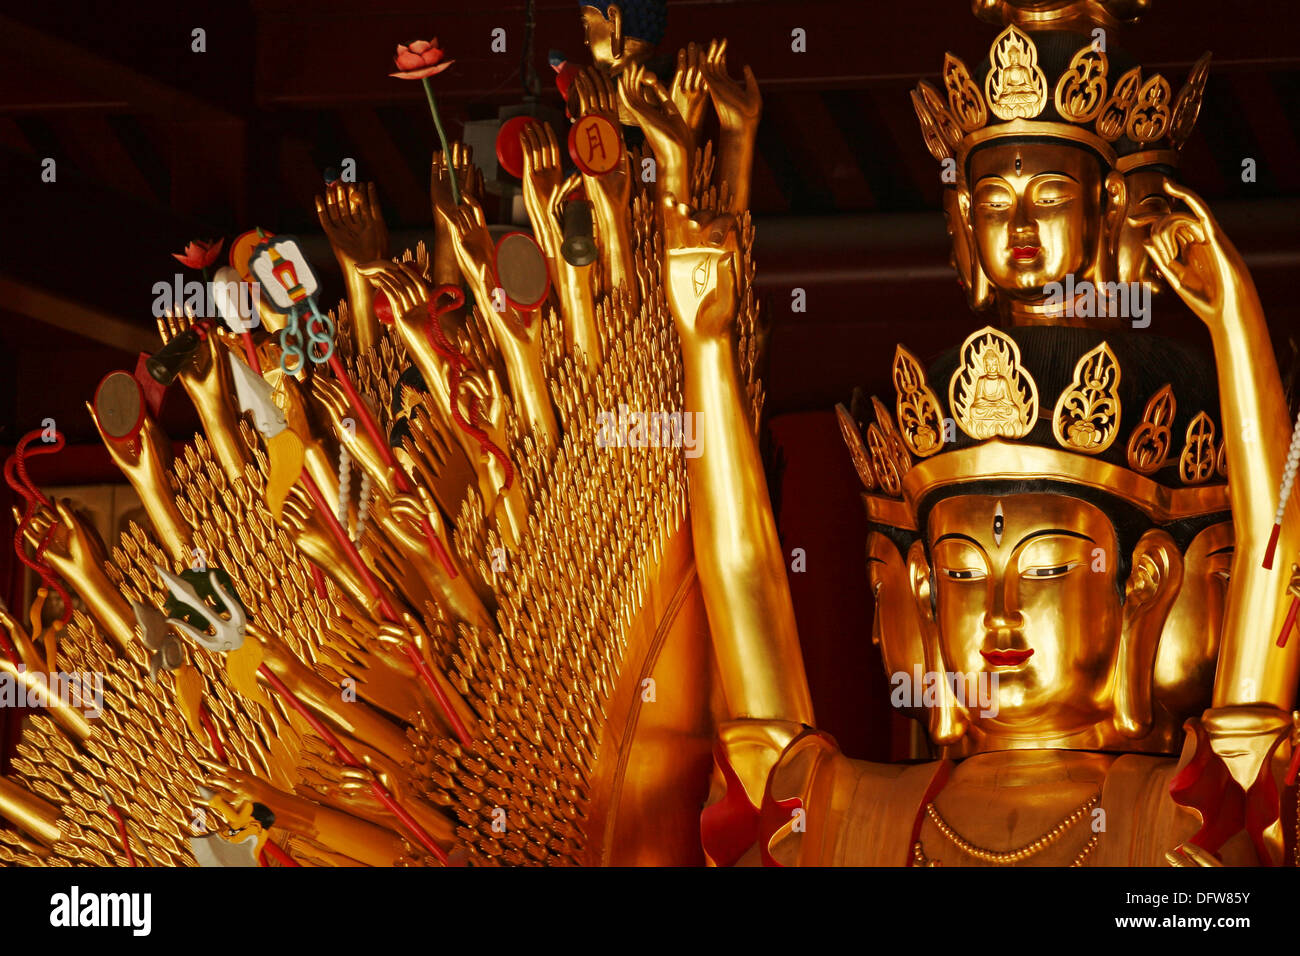 Avalokitesvara Buda Guan-Yin, con mil manos y ojos, Templo Budista Internacional, Richmond, Canadá Foto de stock